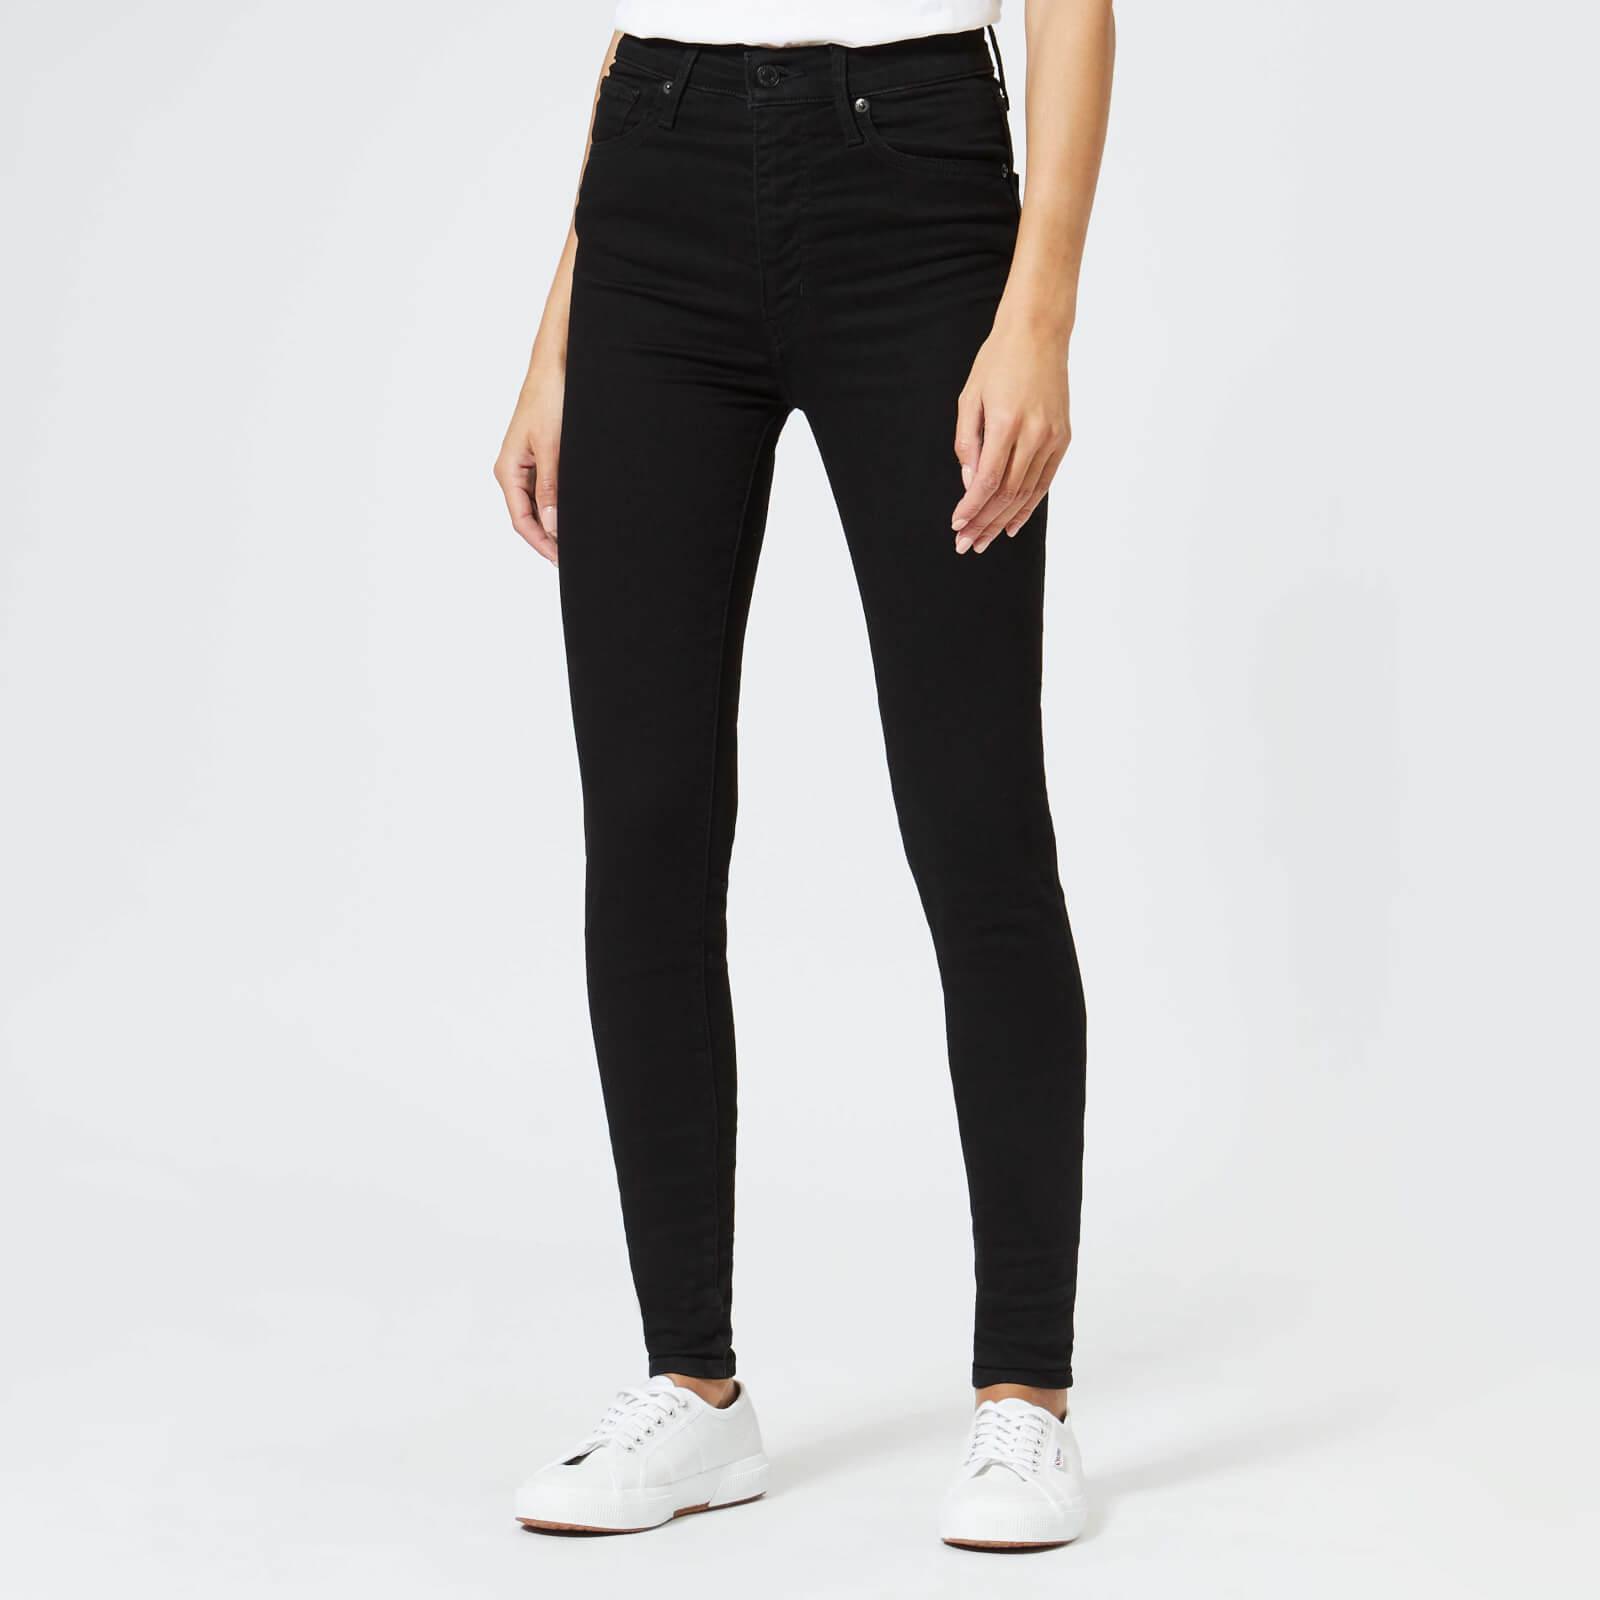 Levi's s Mile High Super Skinny Jeans - Black Galaxy - W28/L30